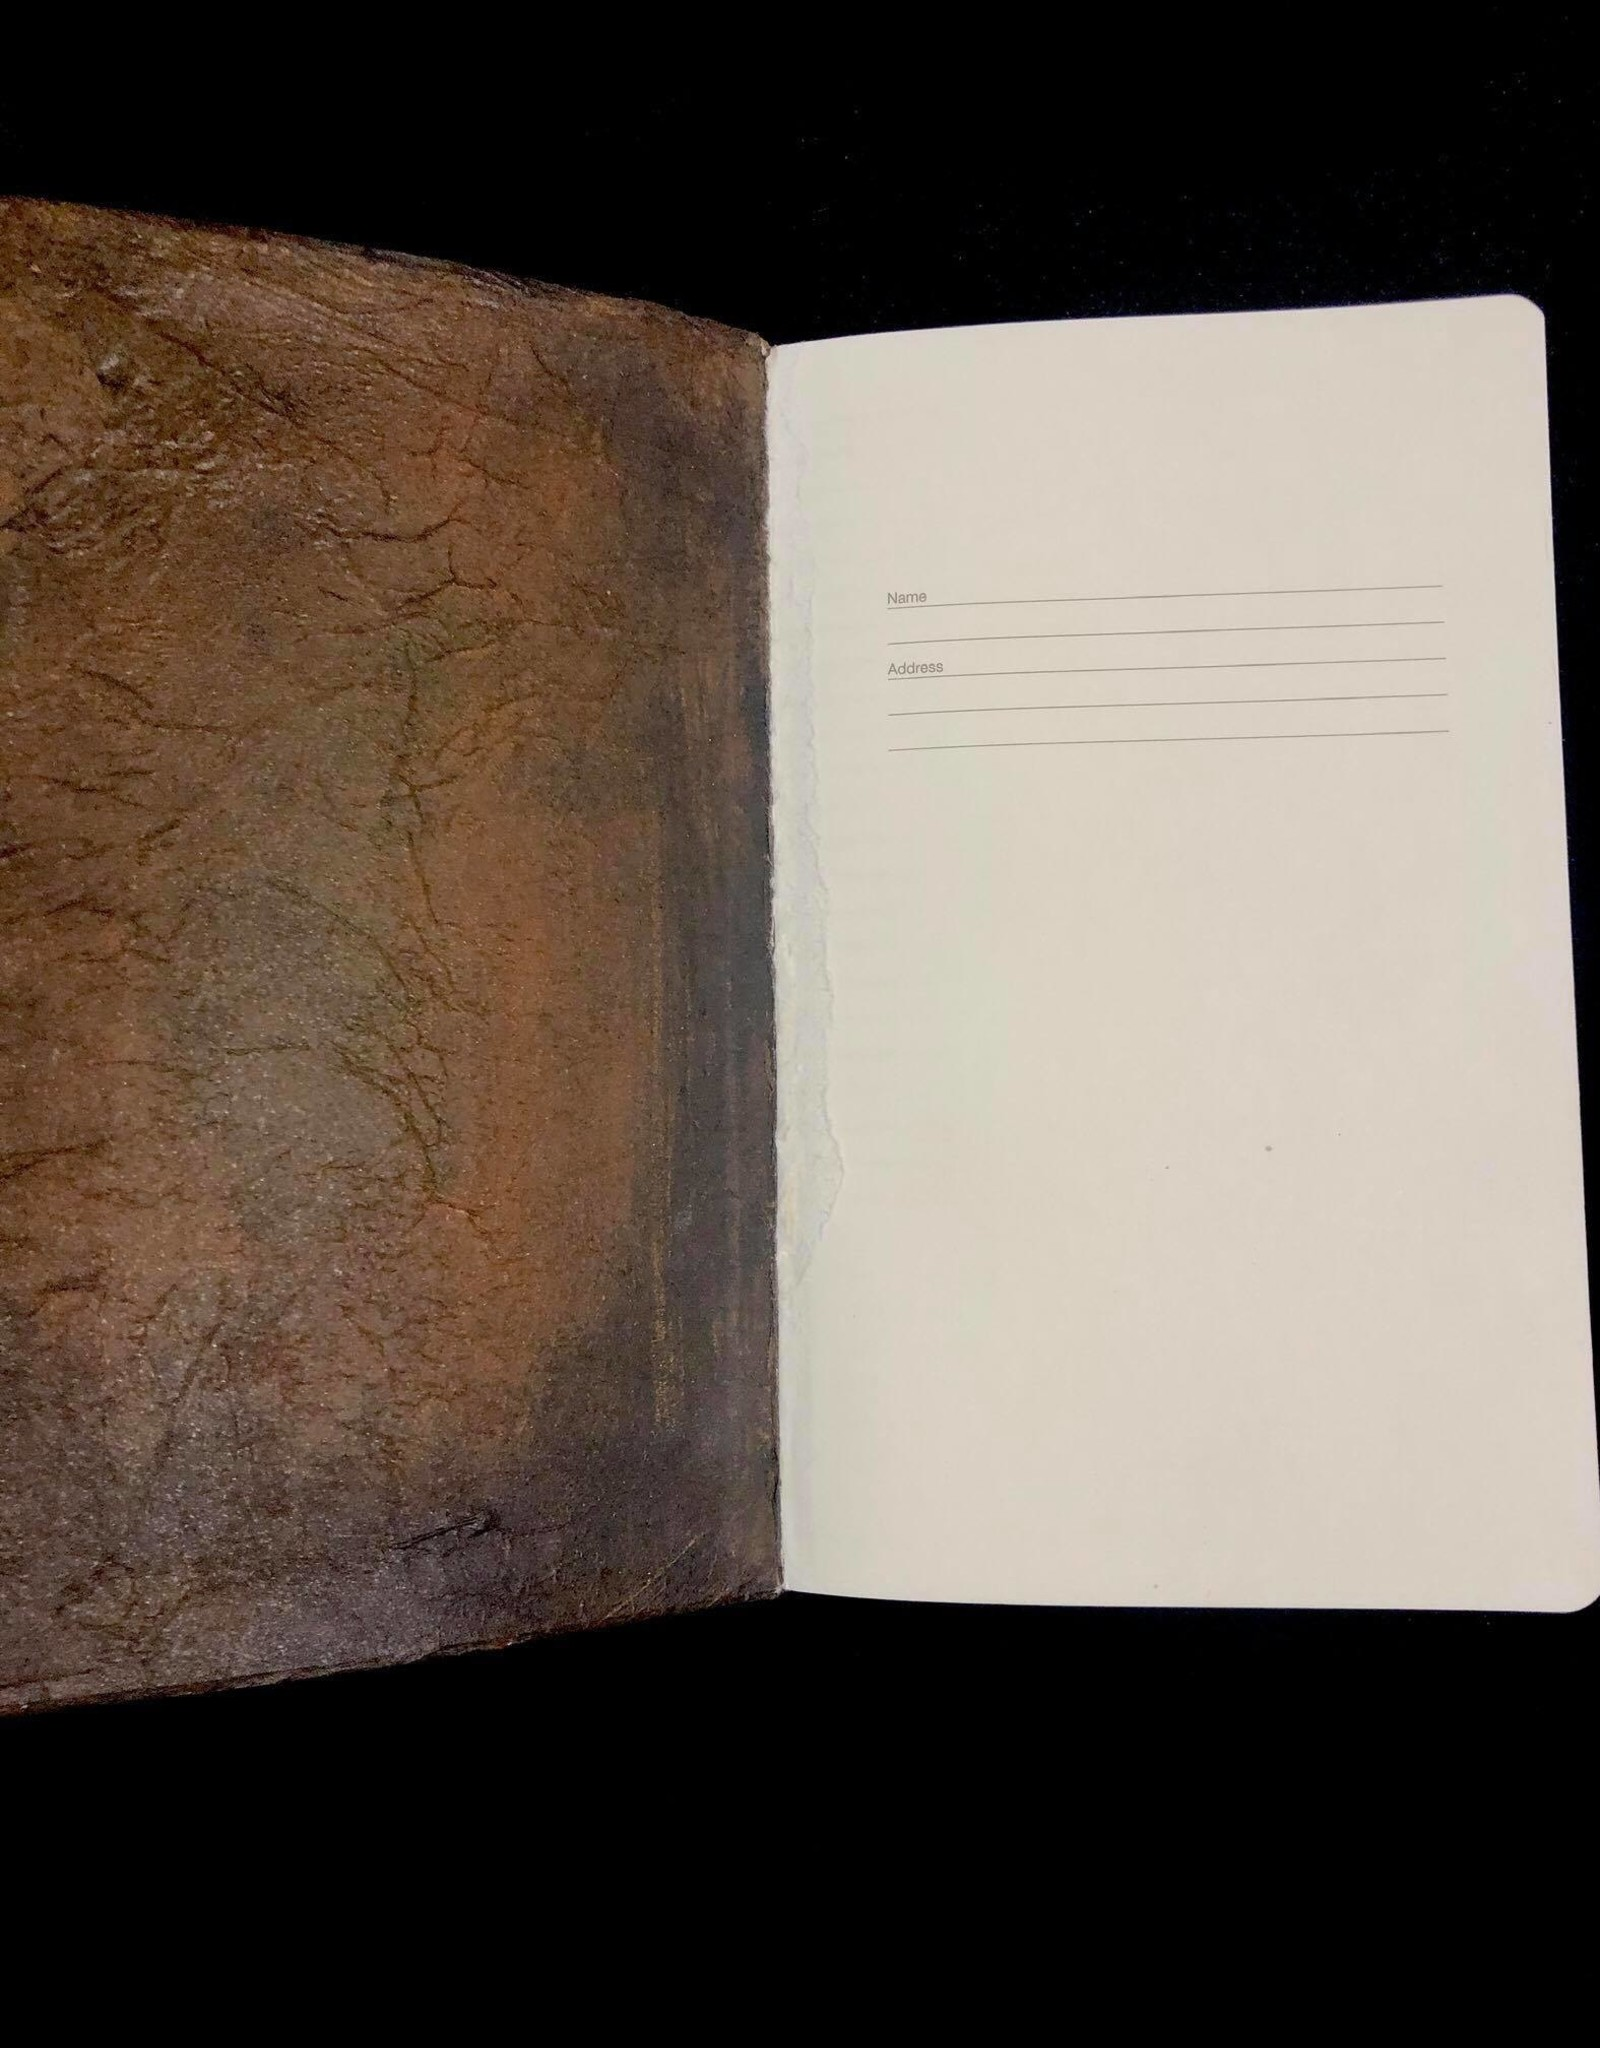 magic beans Necronomicon Notebook